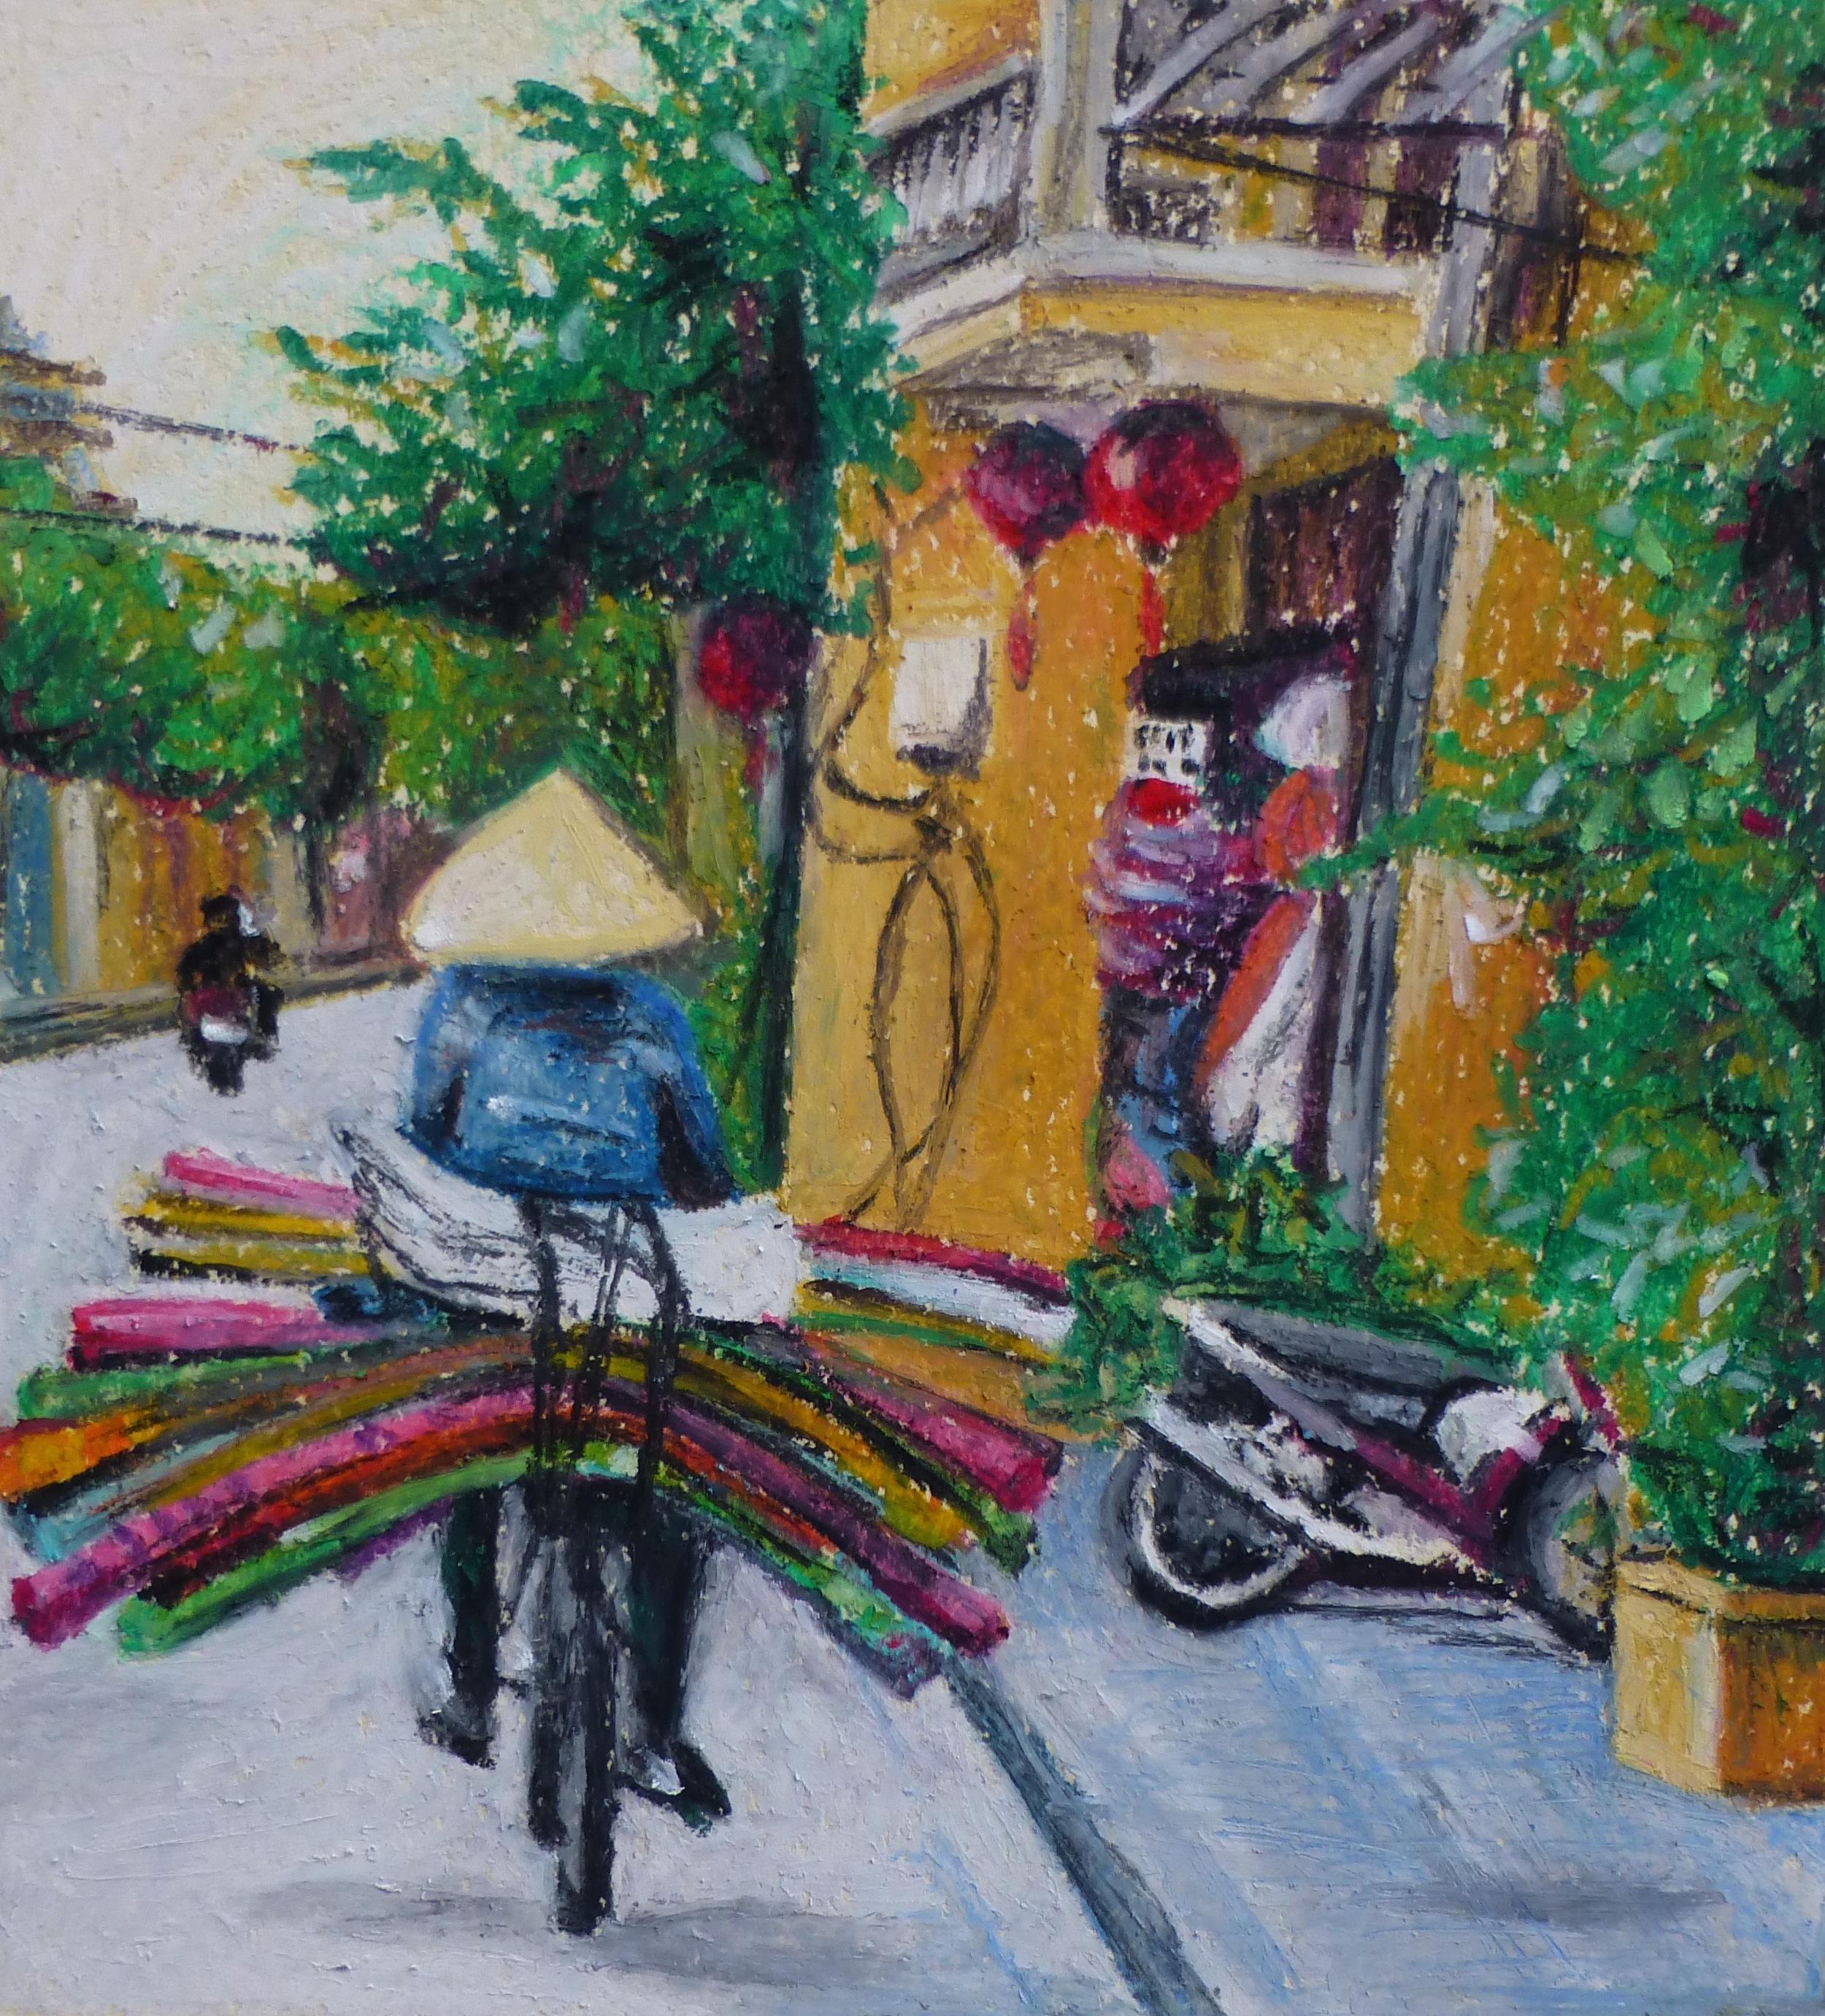 Man on Bike, Vietnam   Oil pastel, 2015  Image size: 16.5cm x 15cm  Sold